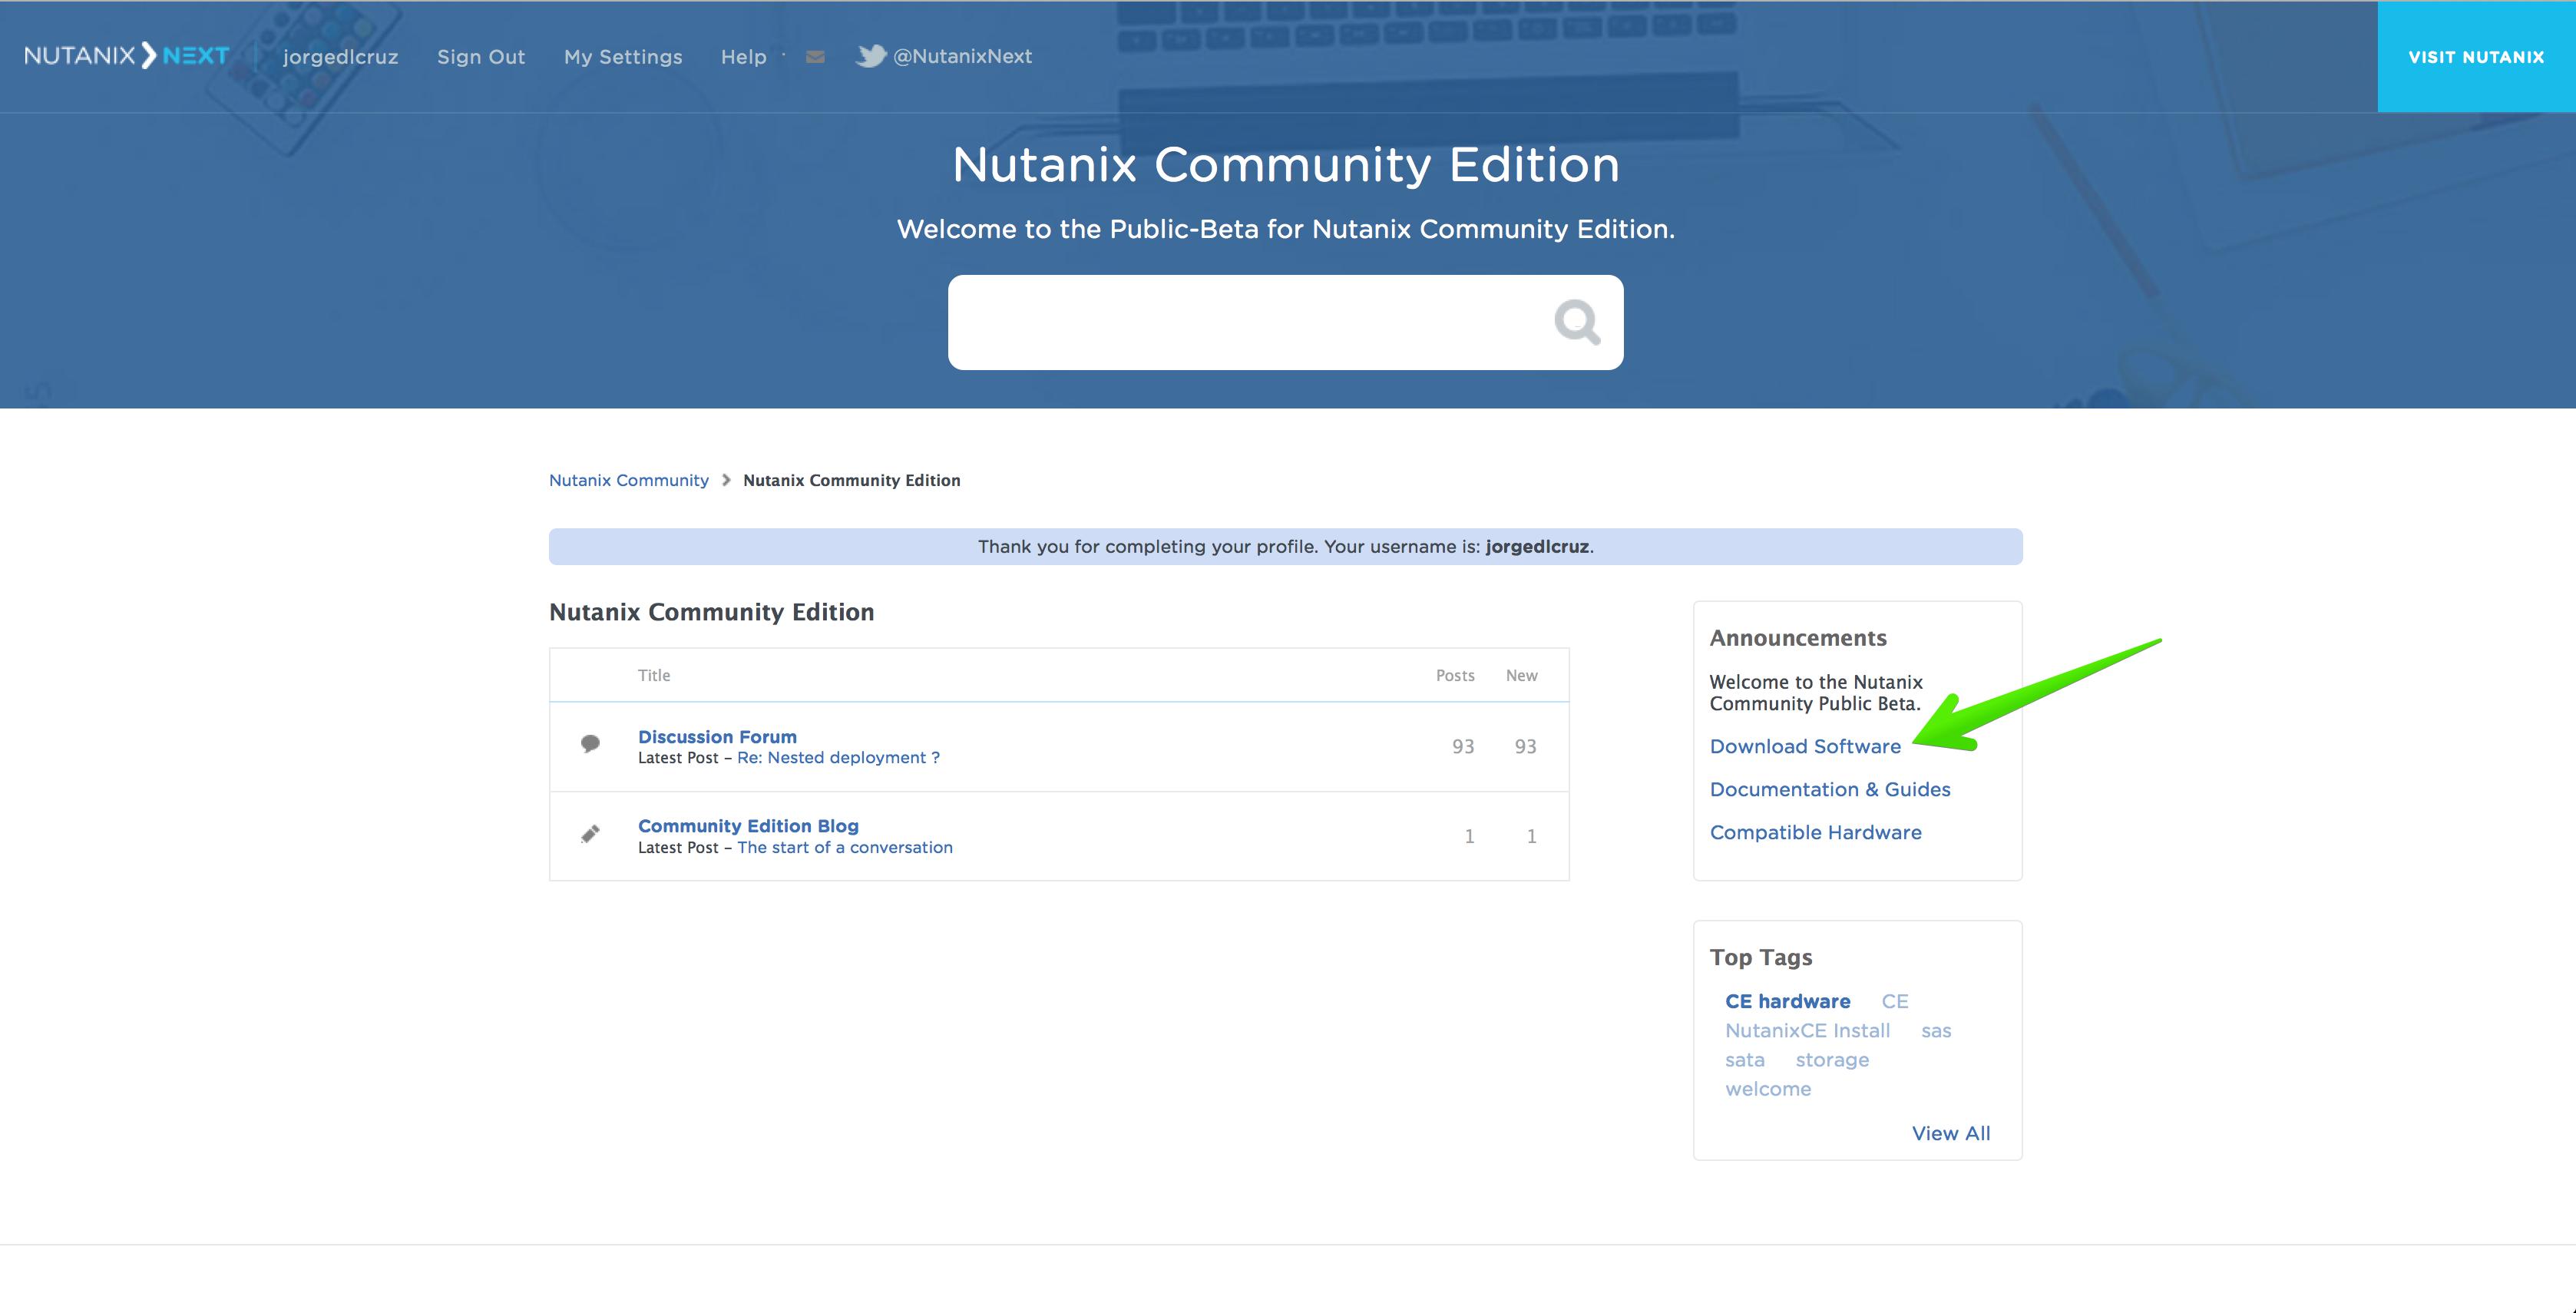 Nutanix: Instalar Nutanix Community Edition en VMware Fusion